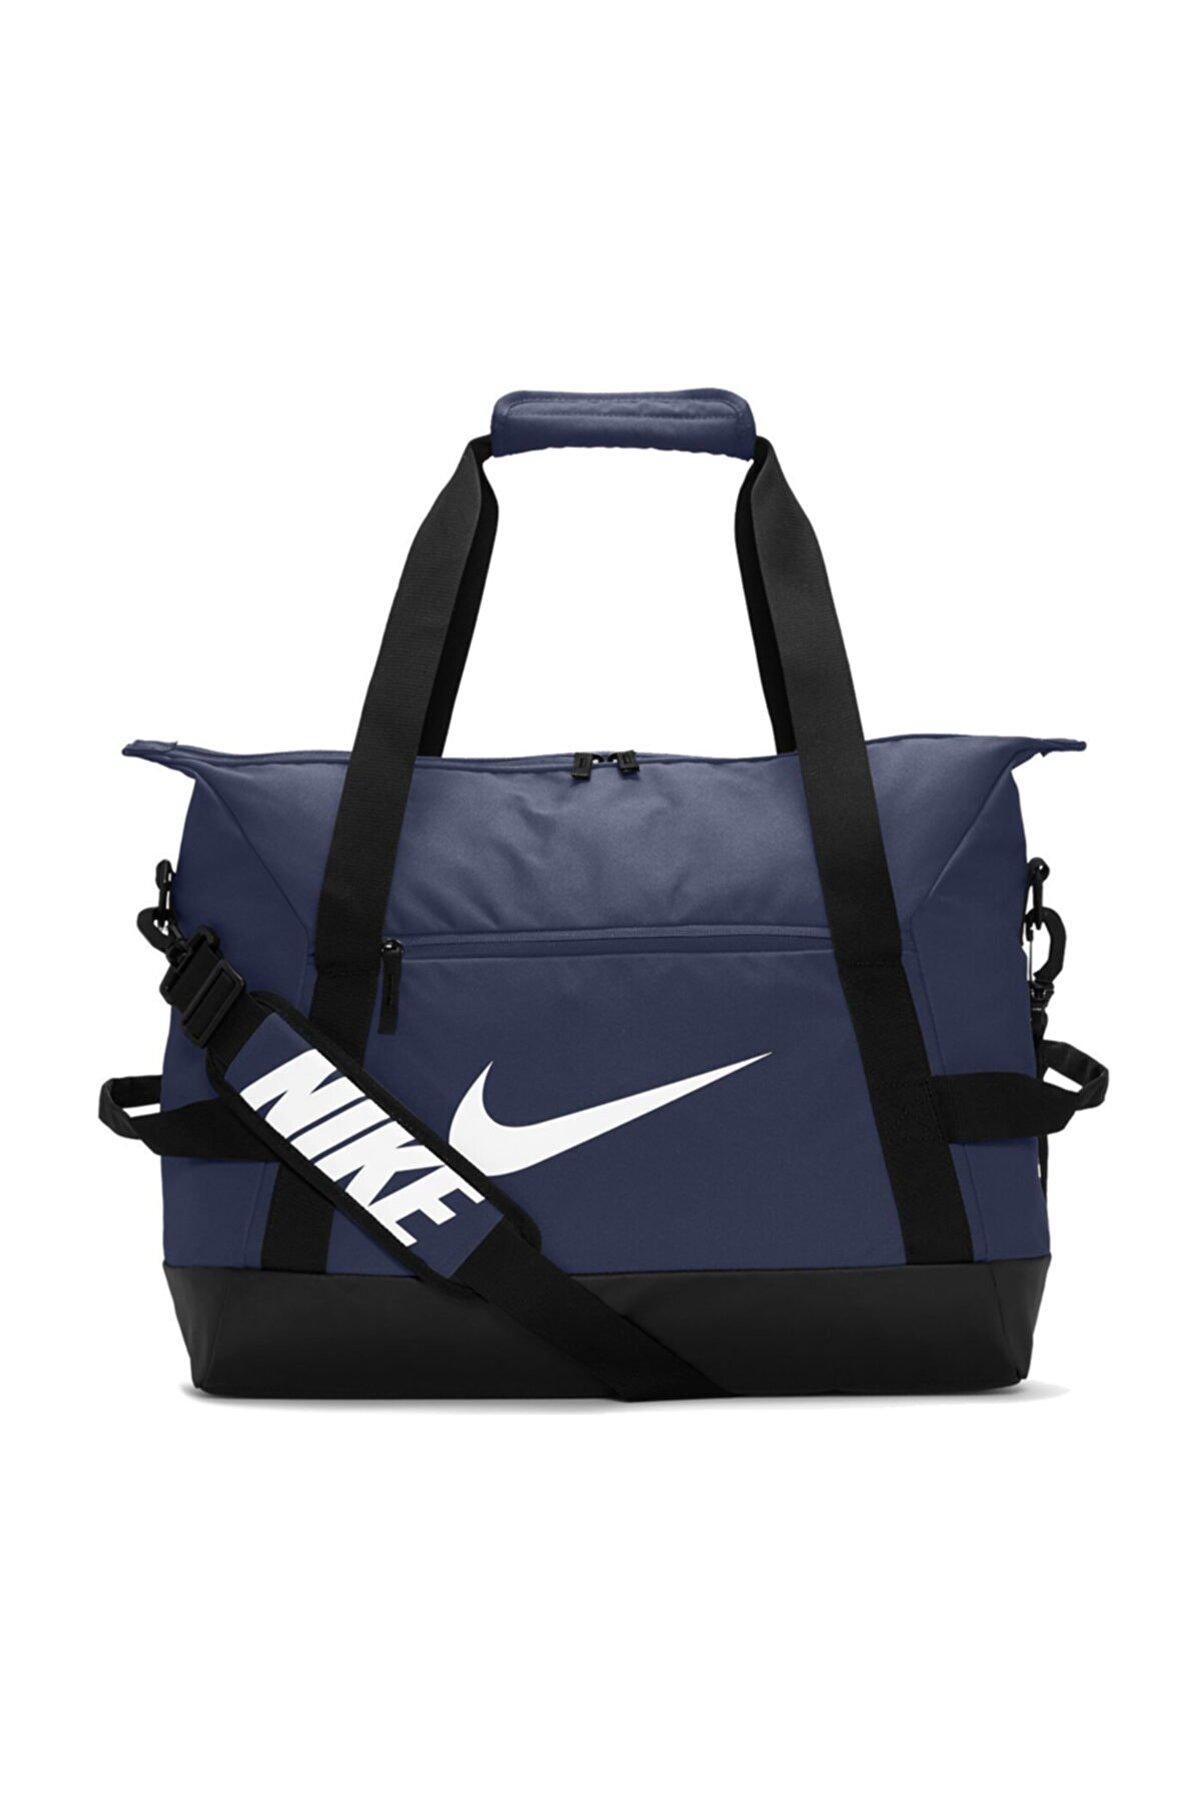 Nike Cv7830-410 Nk Acdmy Team S Duff - Sp20 Unisex Çanta